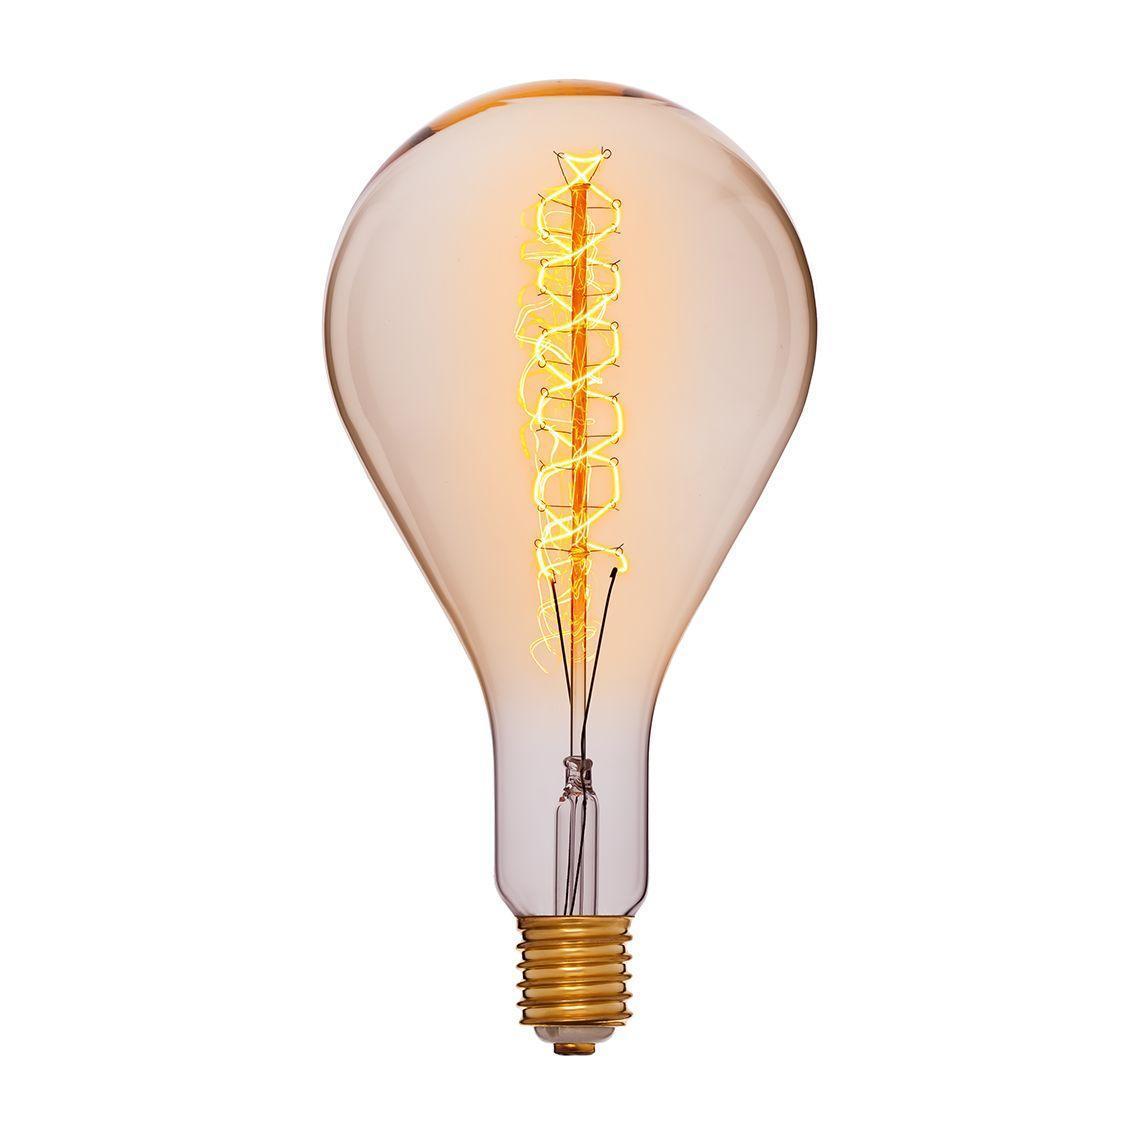 Лампа накаливания E40 95W прозрачная 053-716 лампа металогалогенная 04129 e40 400w 4000к труба прозрачная mh to 400 4000 e40